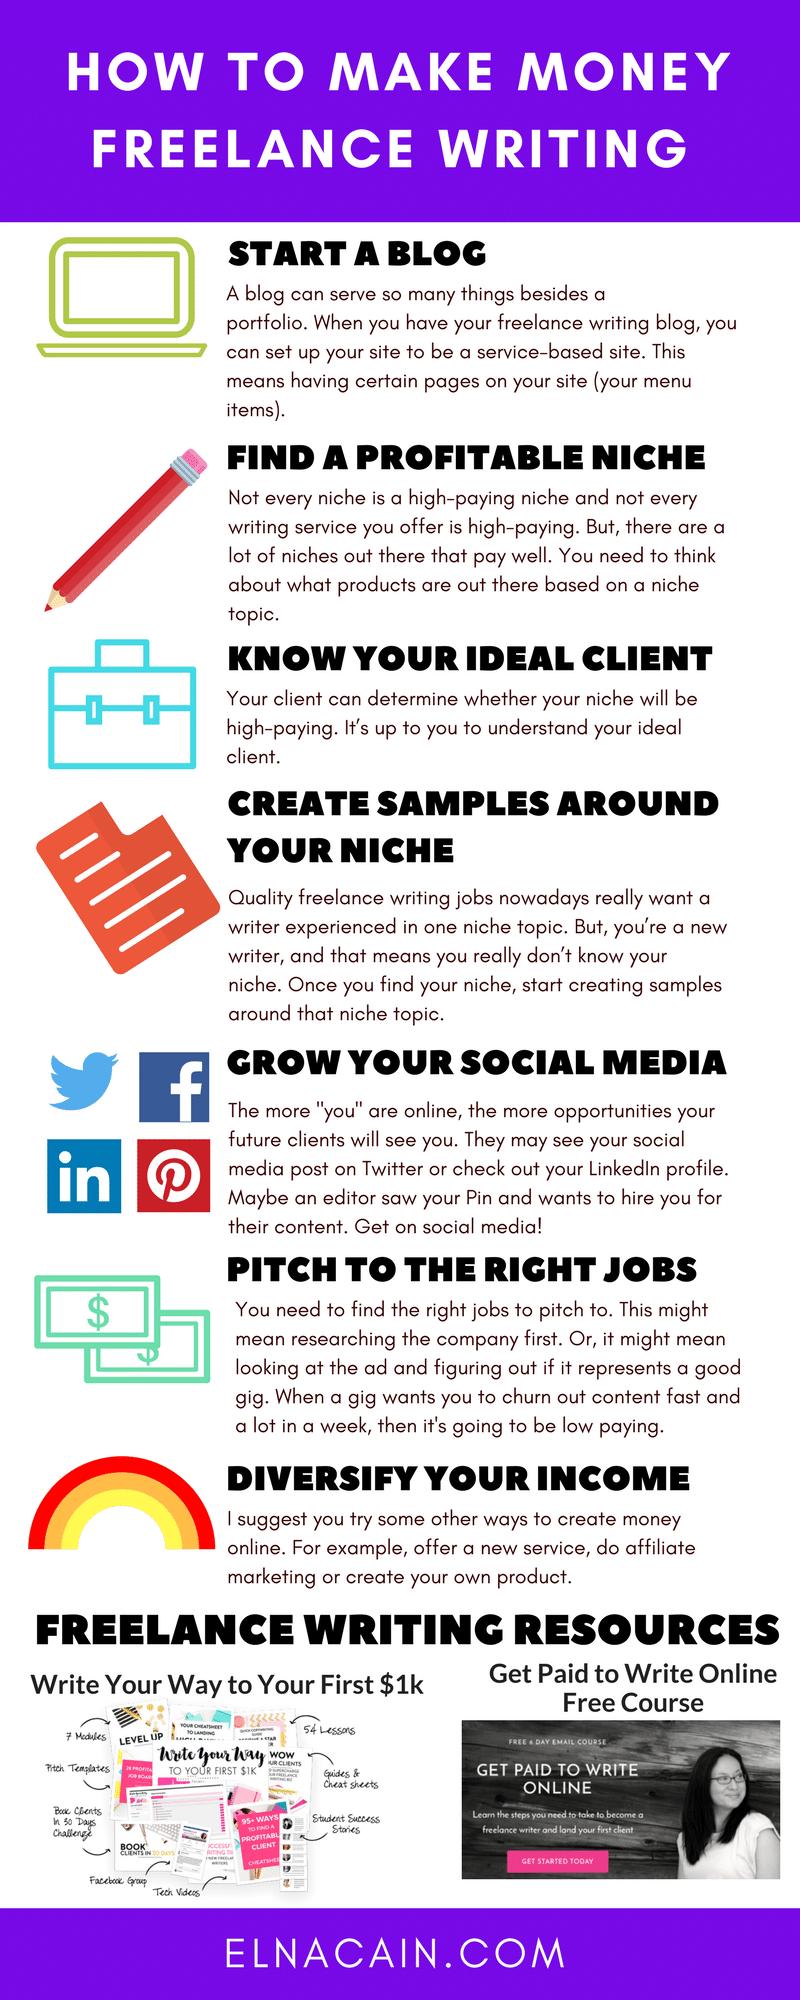 003 How to Make Money Writing As a Freelance Writer Make